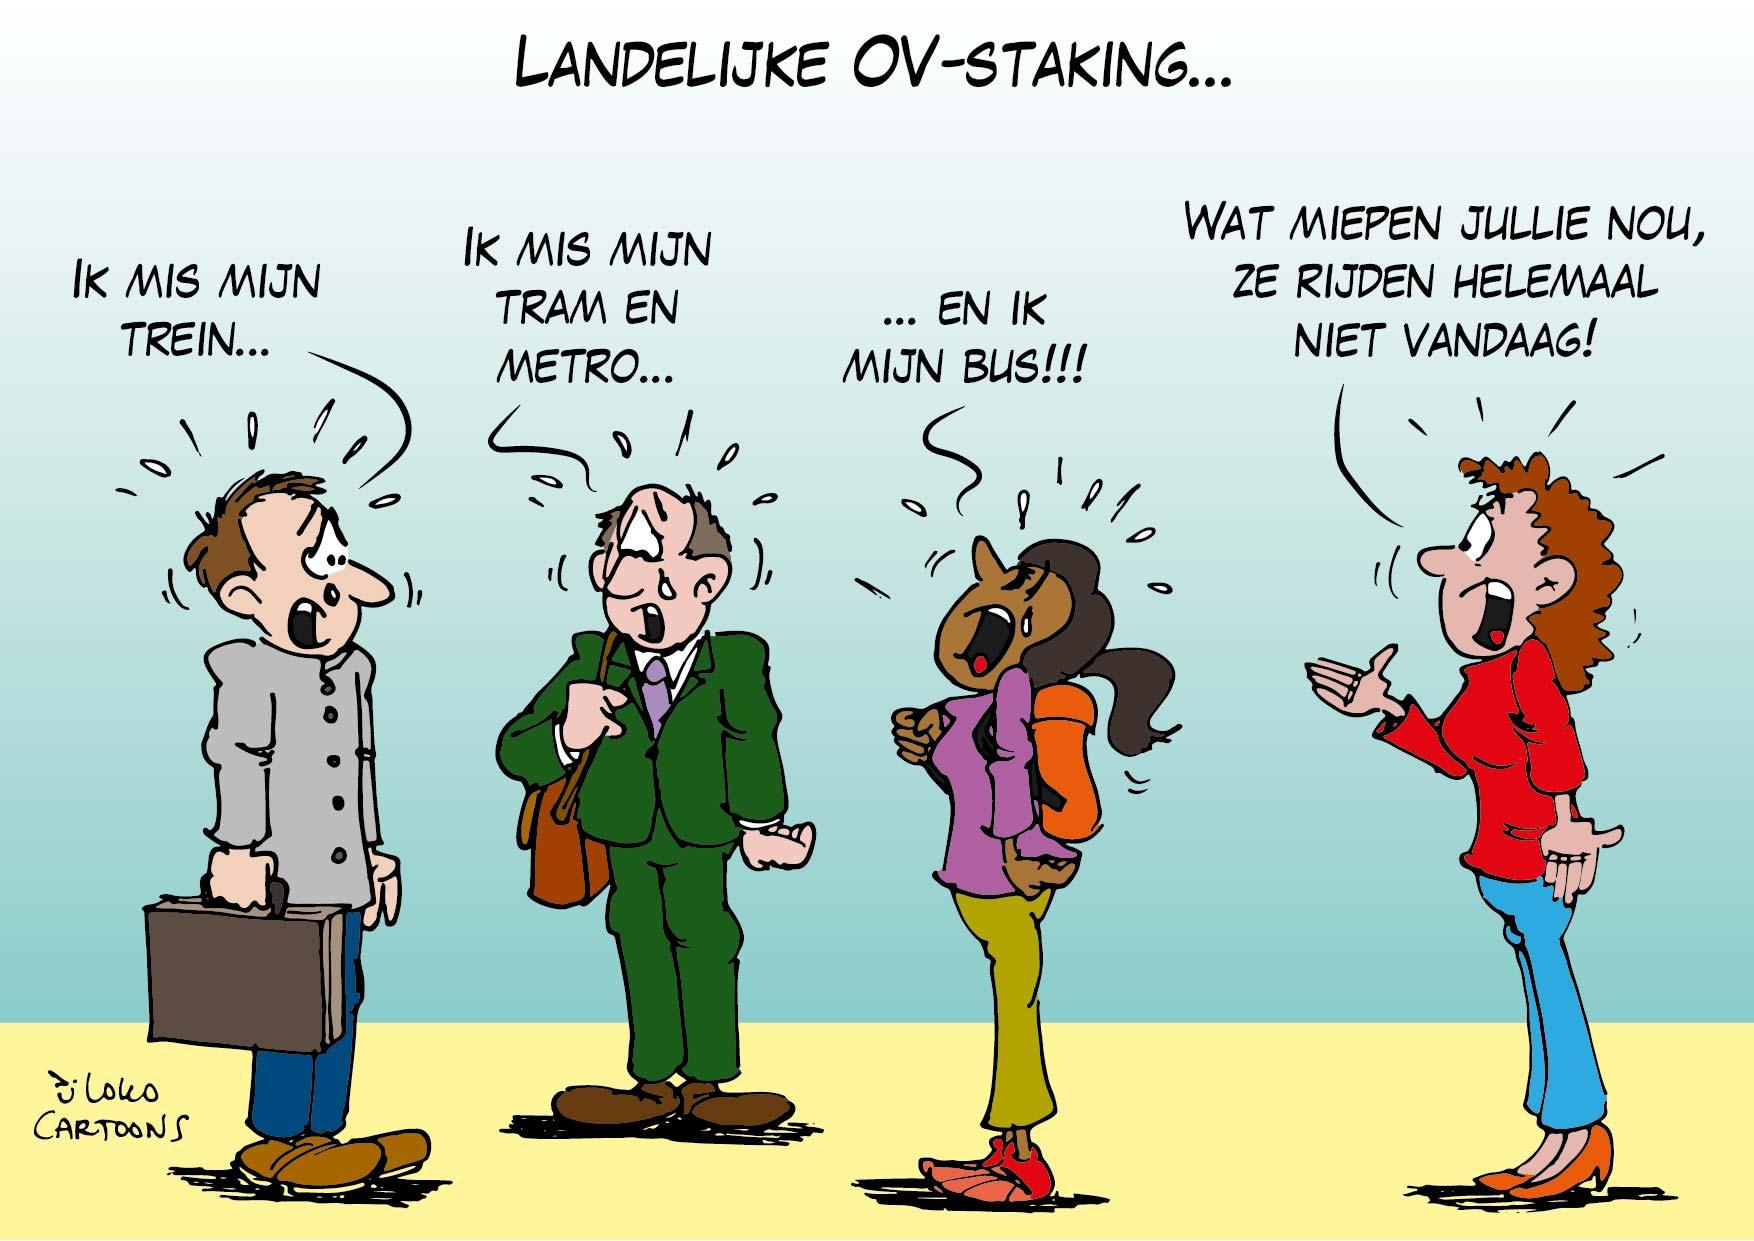 Landelijke OV-staking…